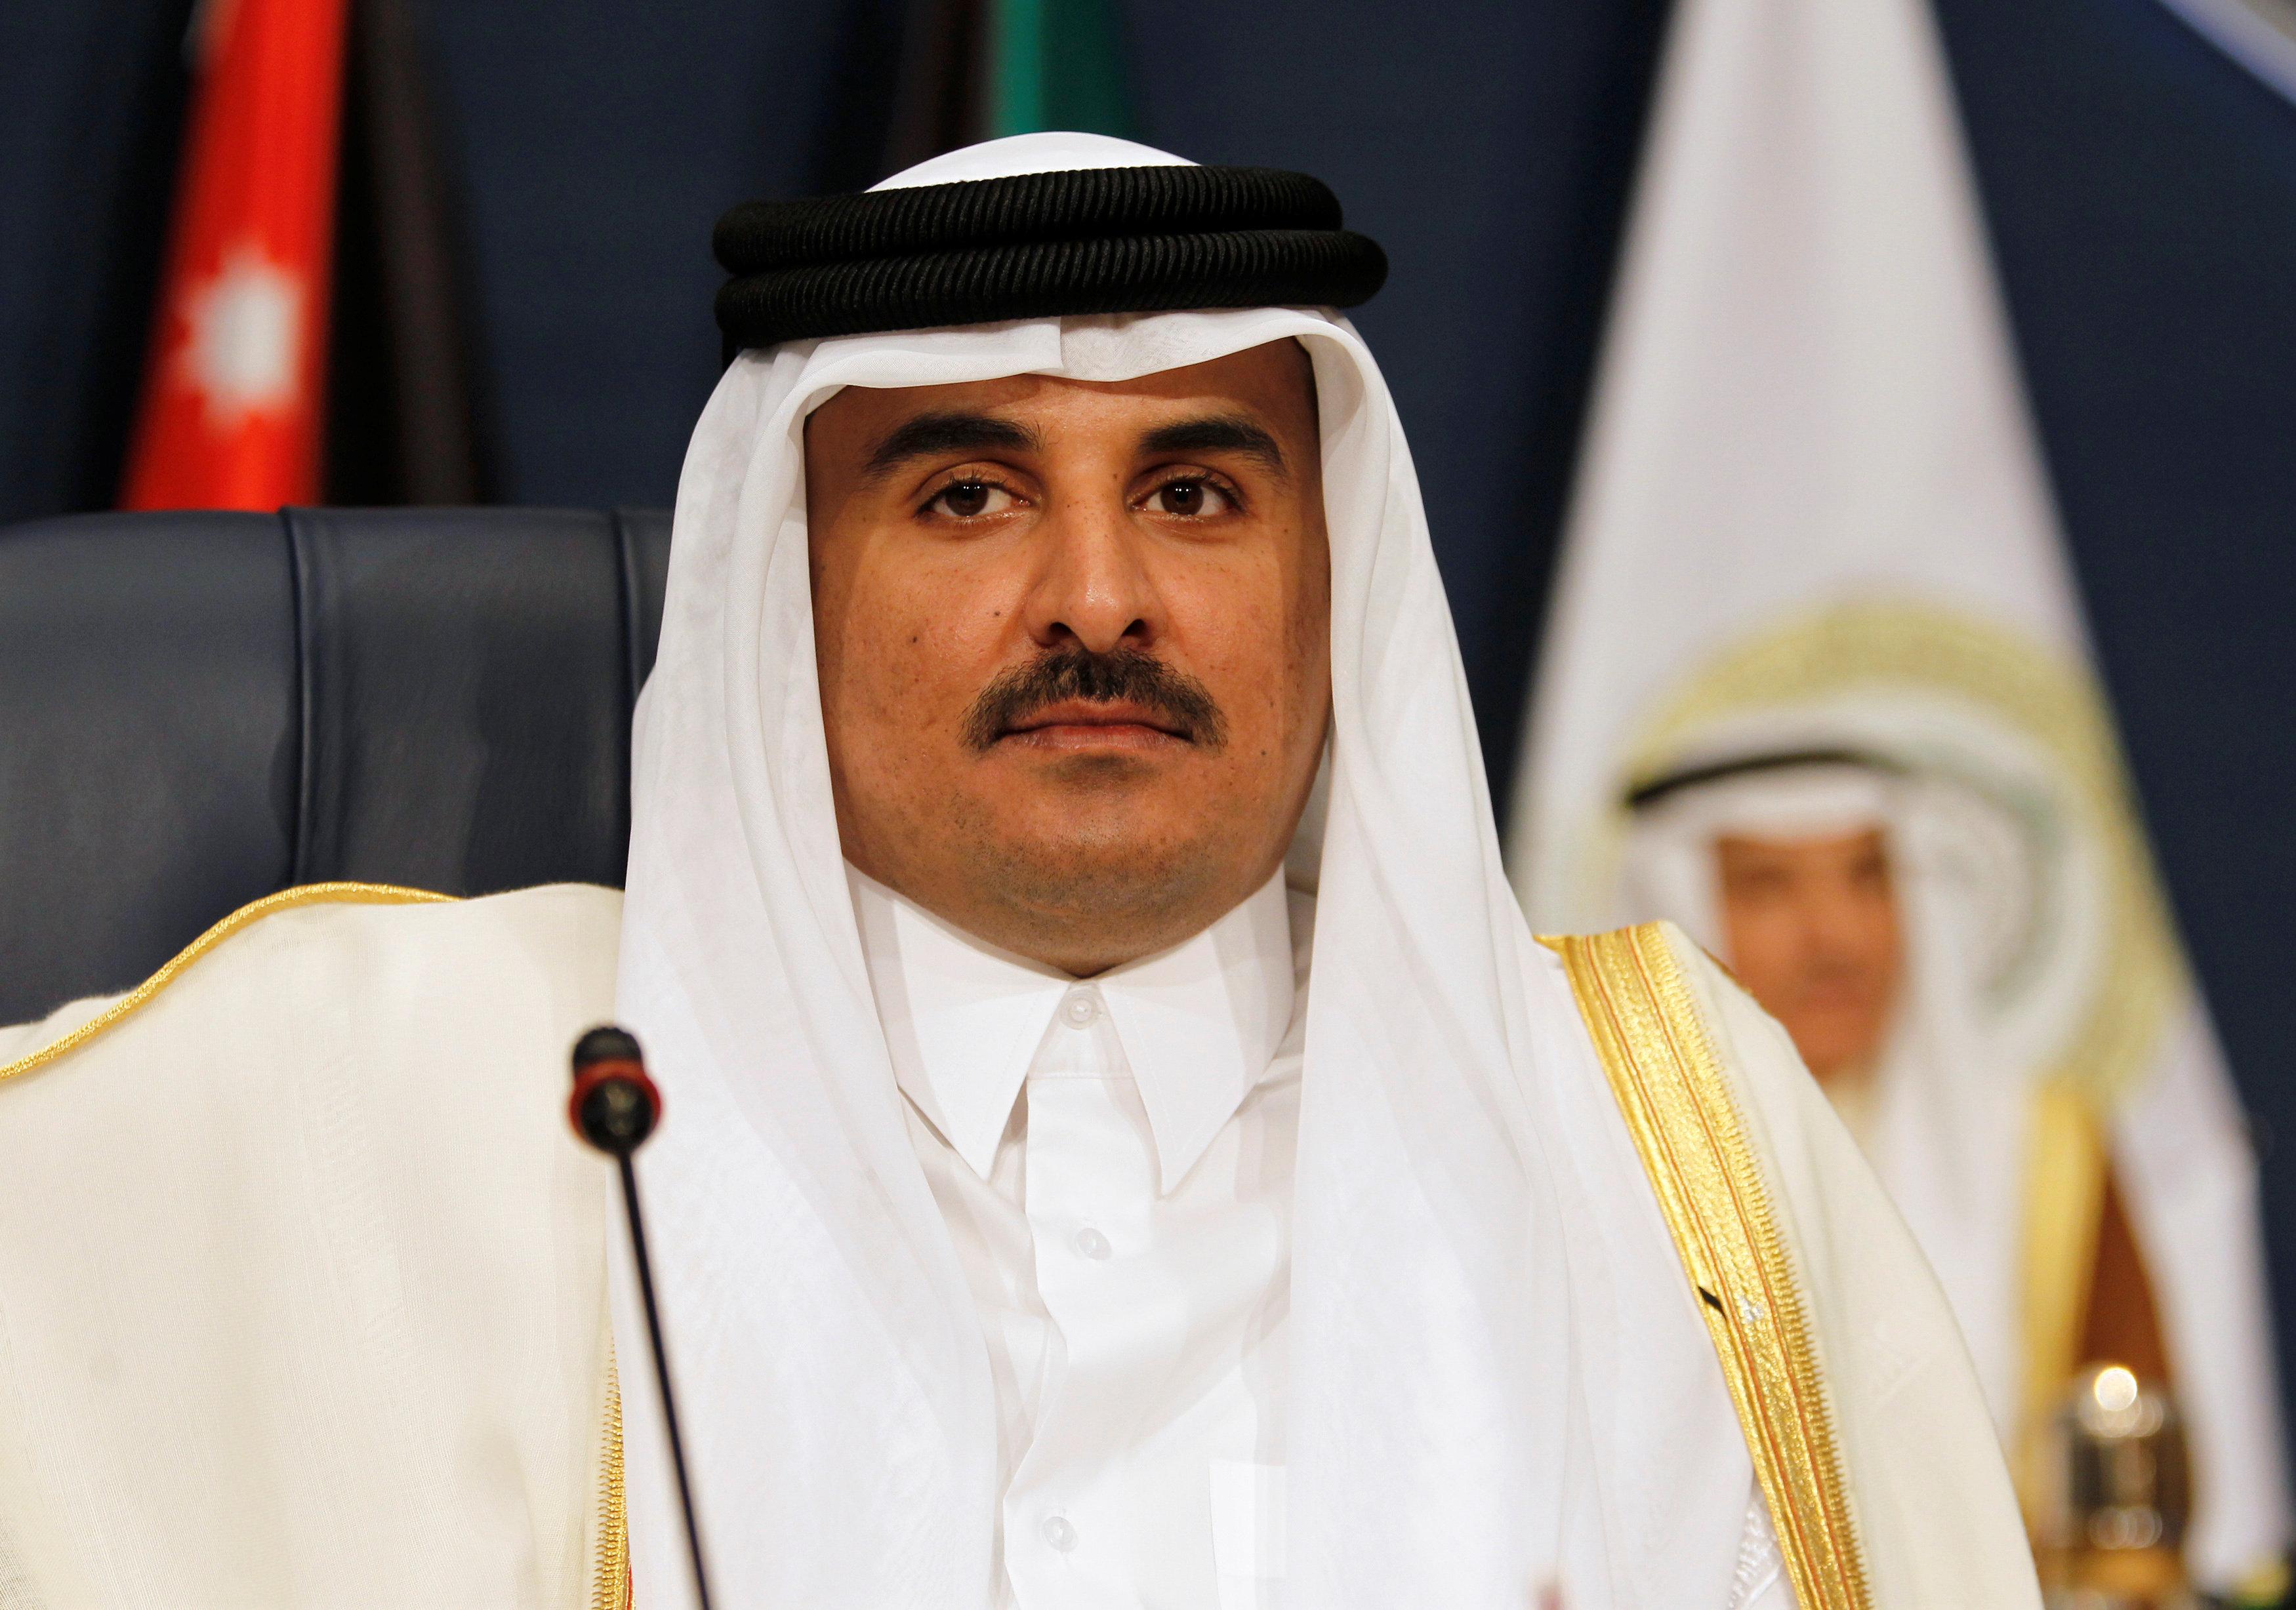 Emir of Qatar Sheikh Tamim bin Hamad al-Thani attends the 25th Arab Summit in Kuwait City on March 25, 2014. (REUTERS/Hamad I Mohammed)